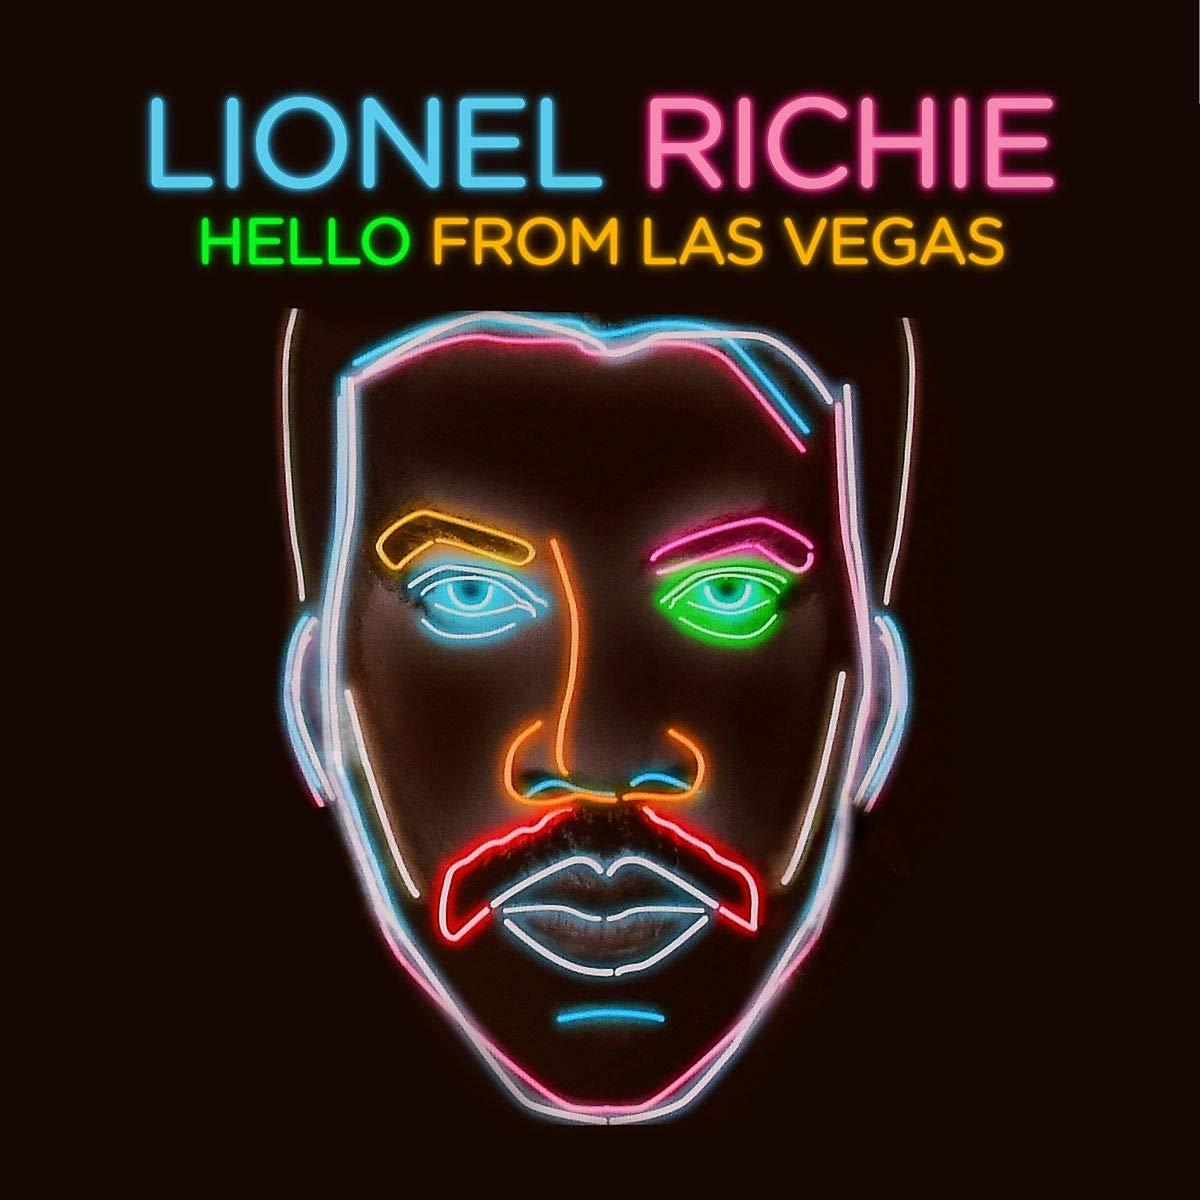 lionel richie live